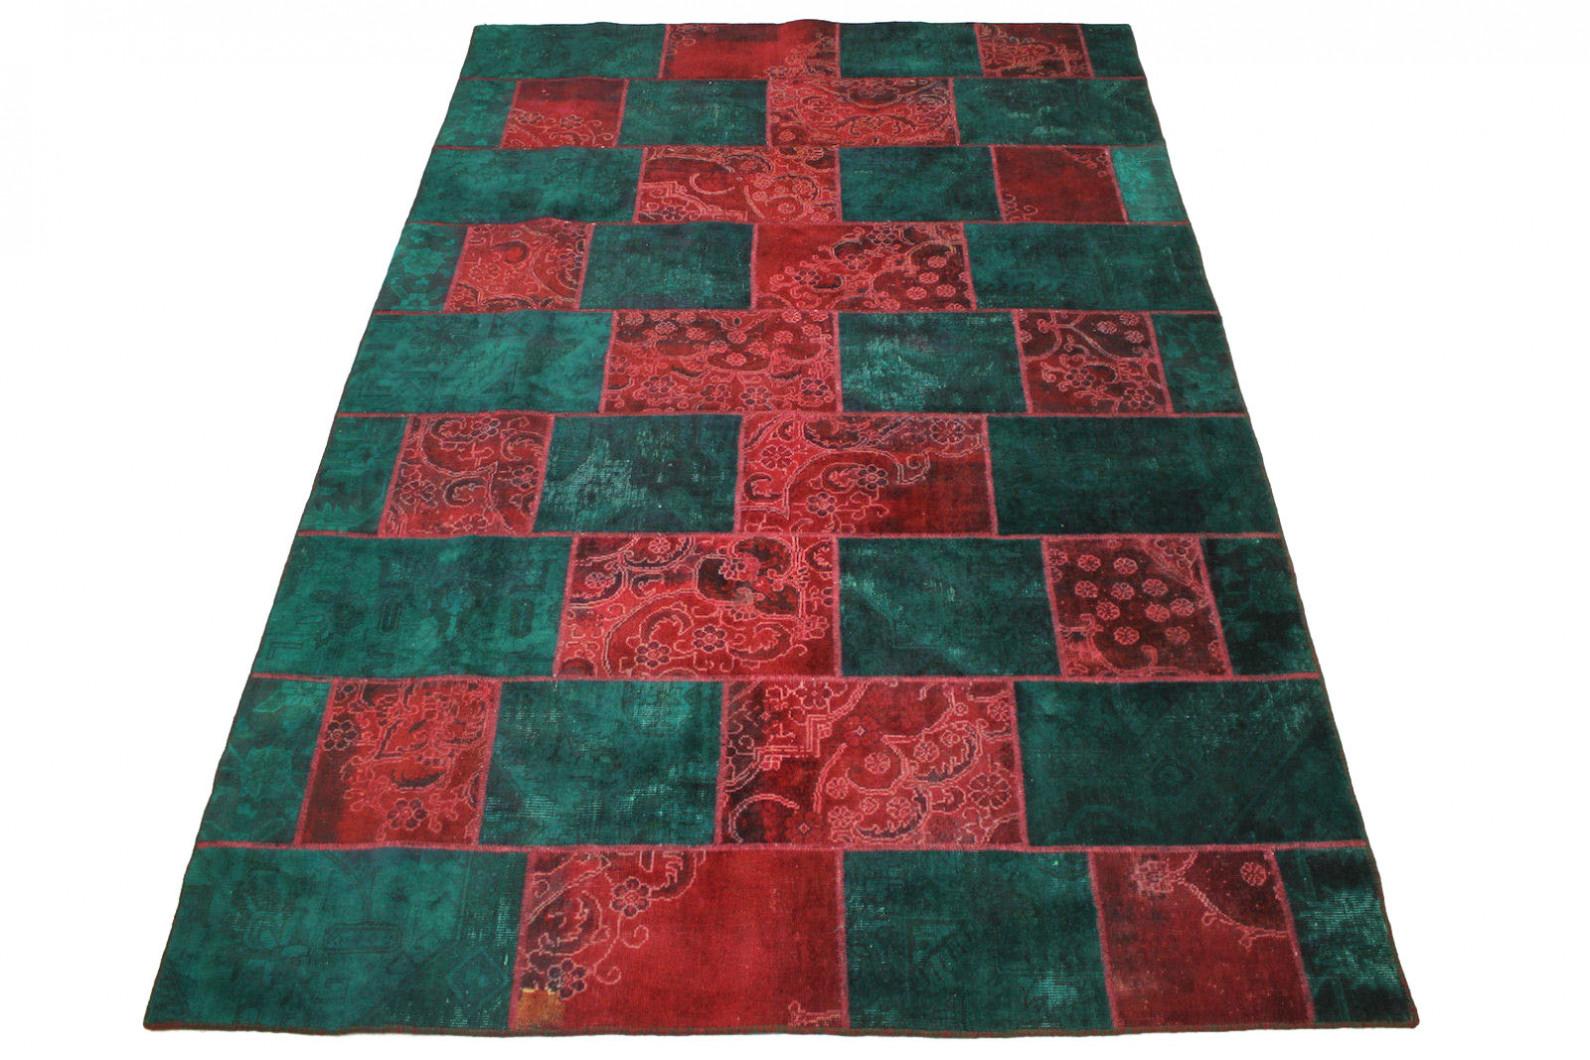 Patchwork Teppich Rot Türkis in 300x200cm (1 / 5)